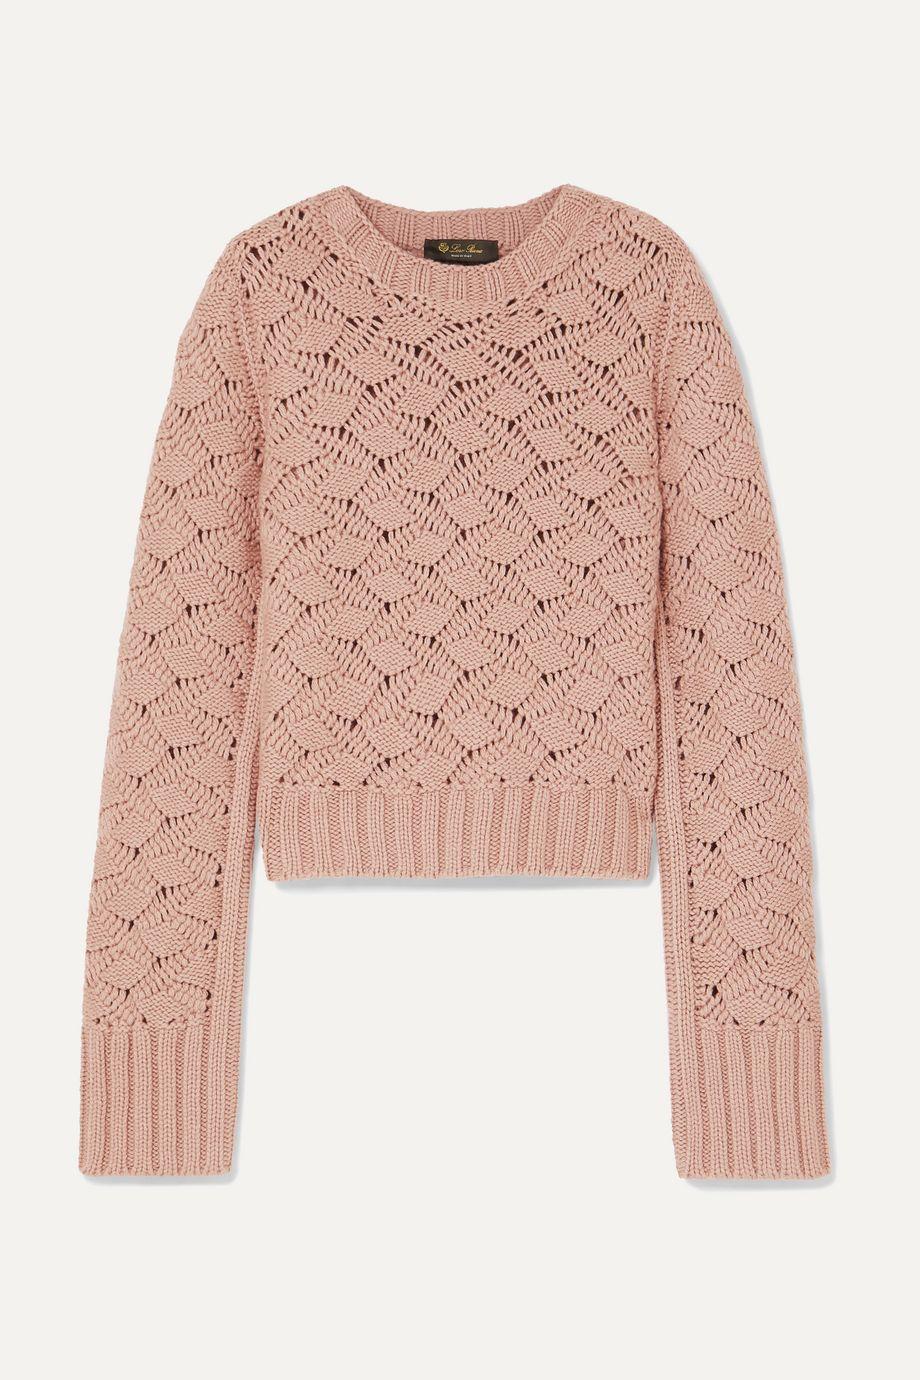 Loro Piana Cable-knit cashmere sweater